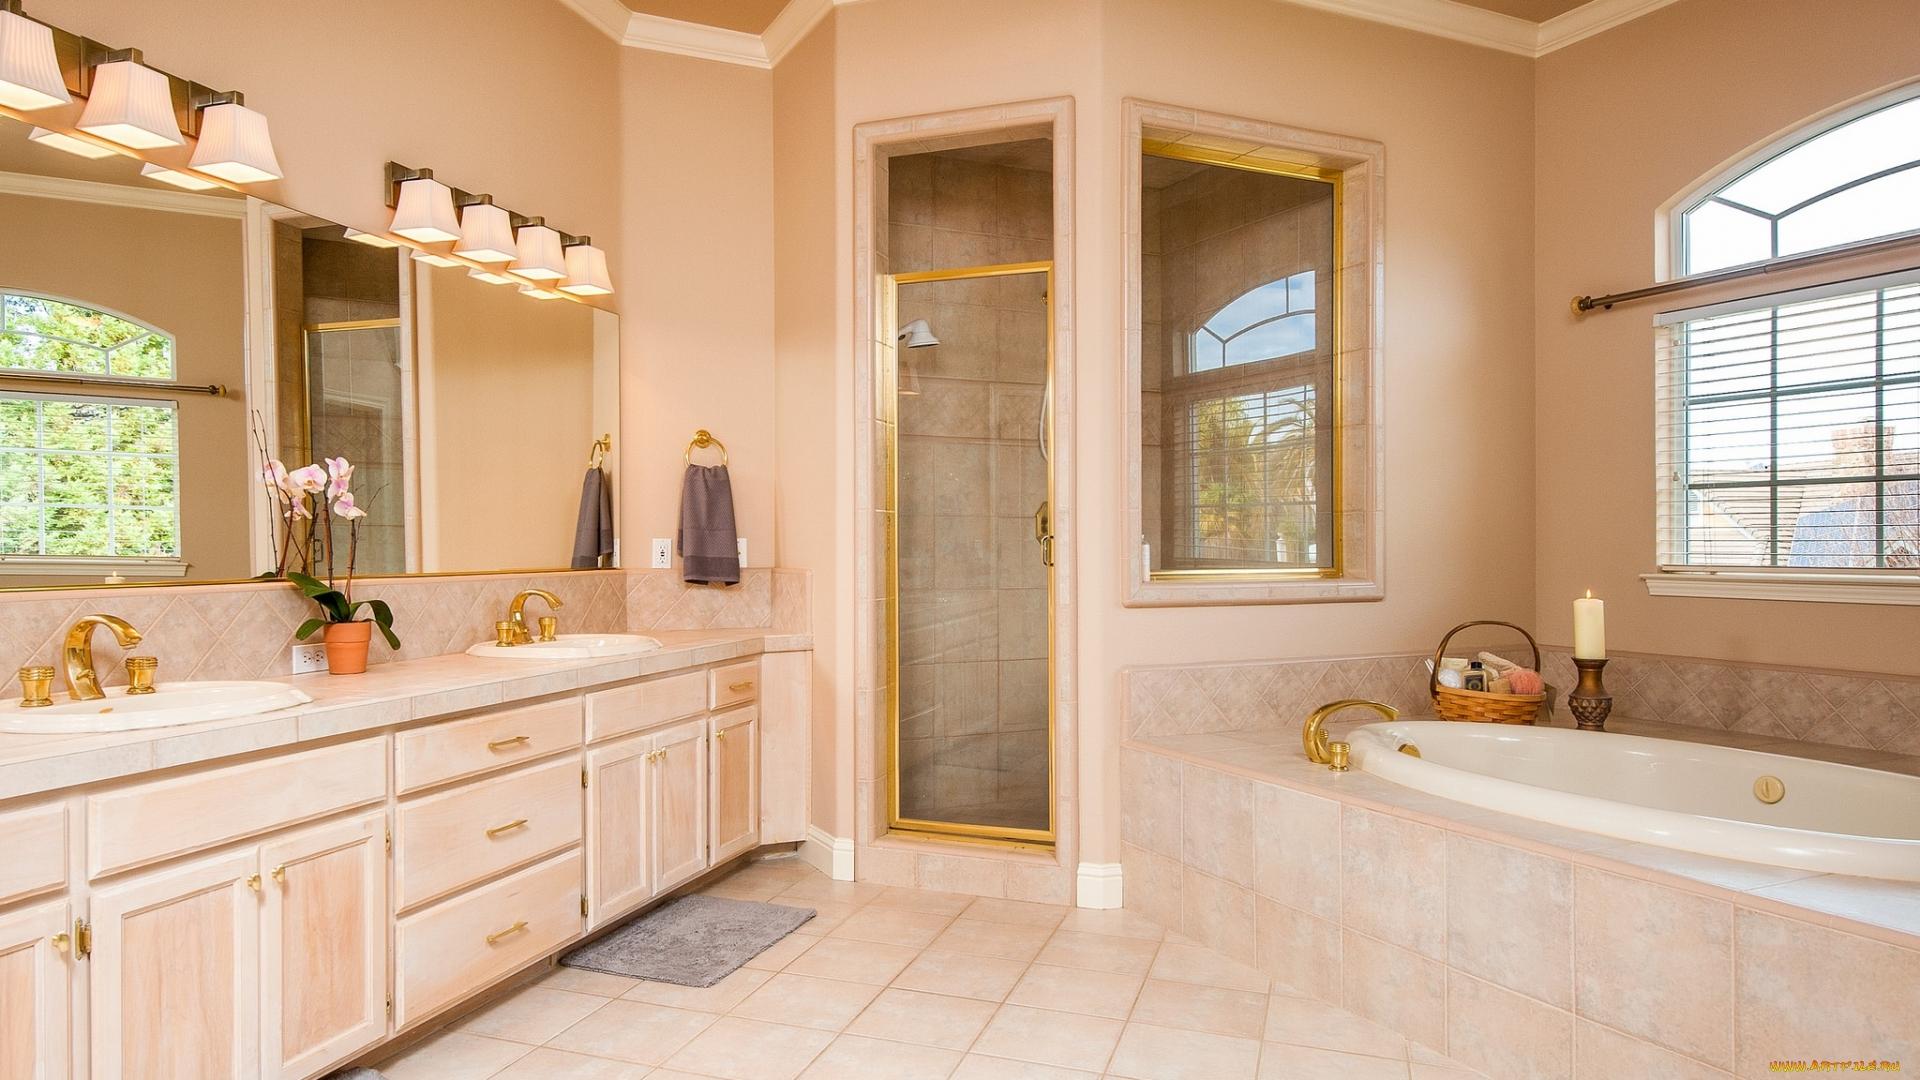 ванна, окно, двери